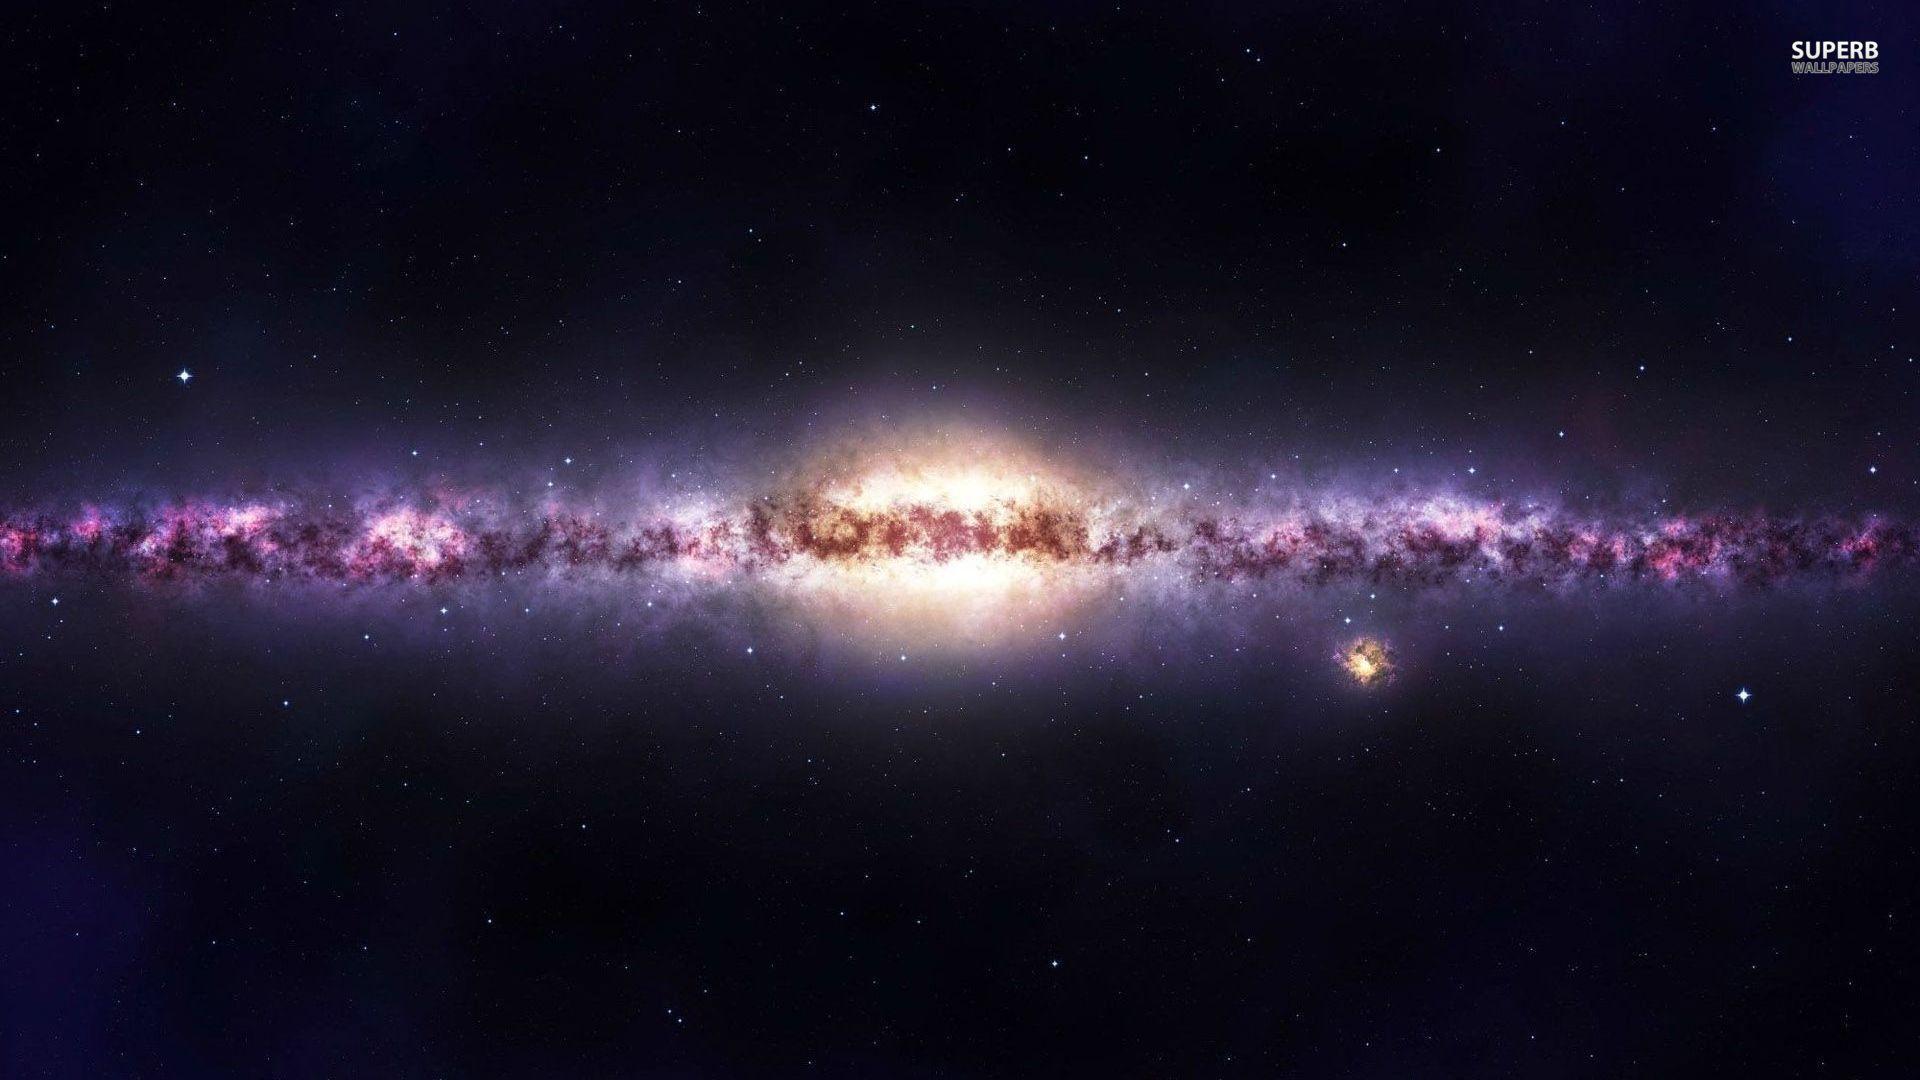 wallpapers widescreen 1920x1080 galaxy - photo #10